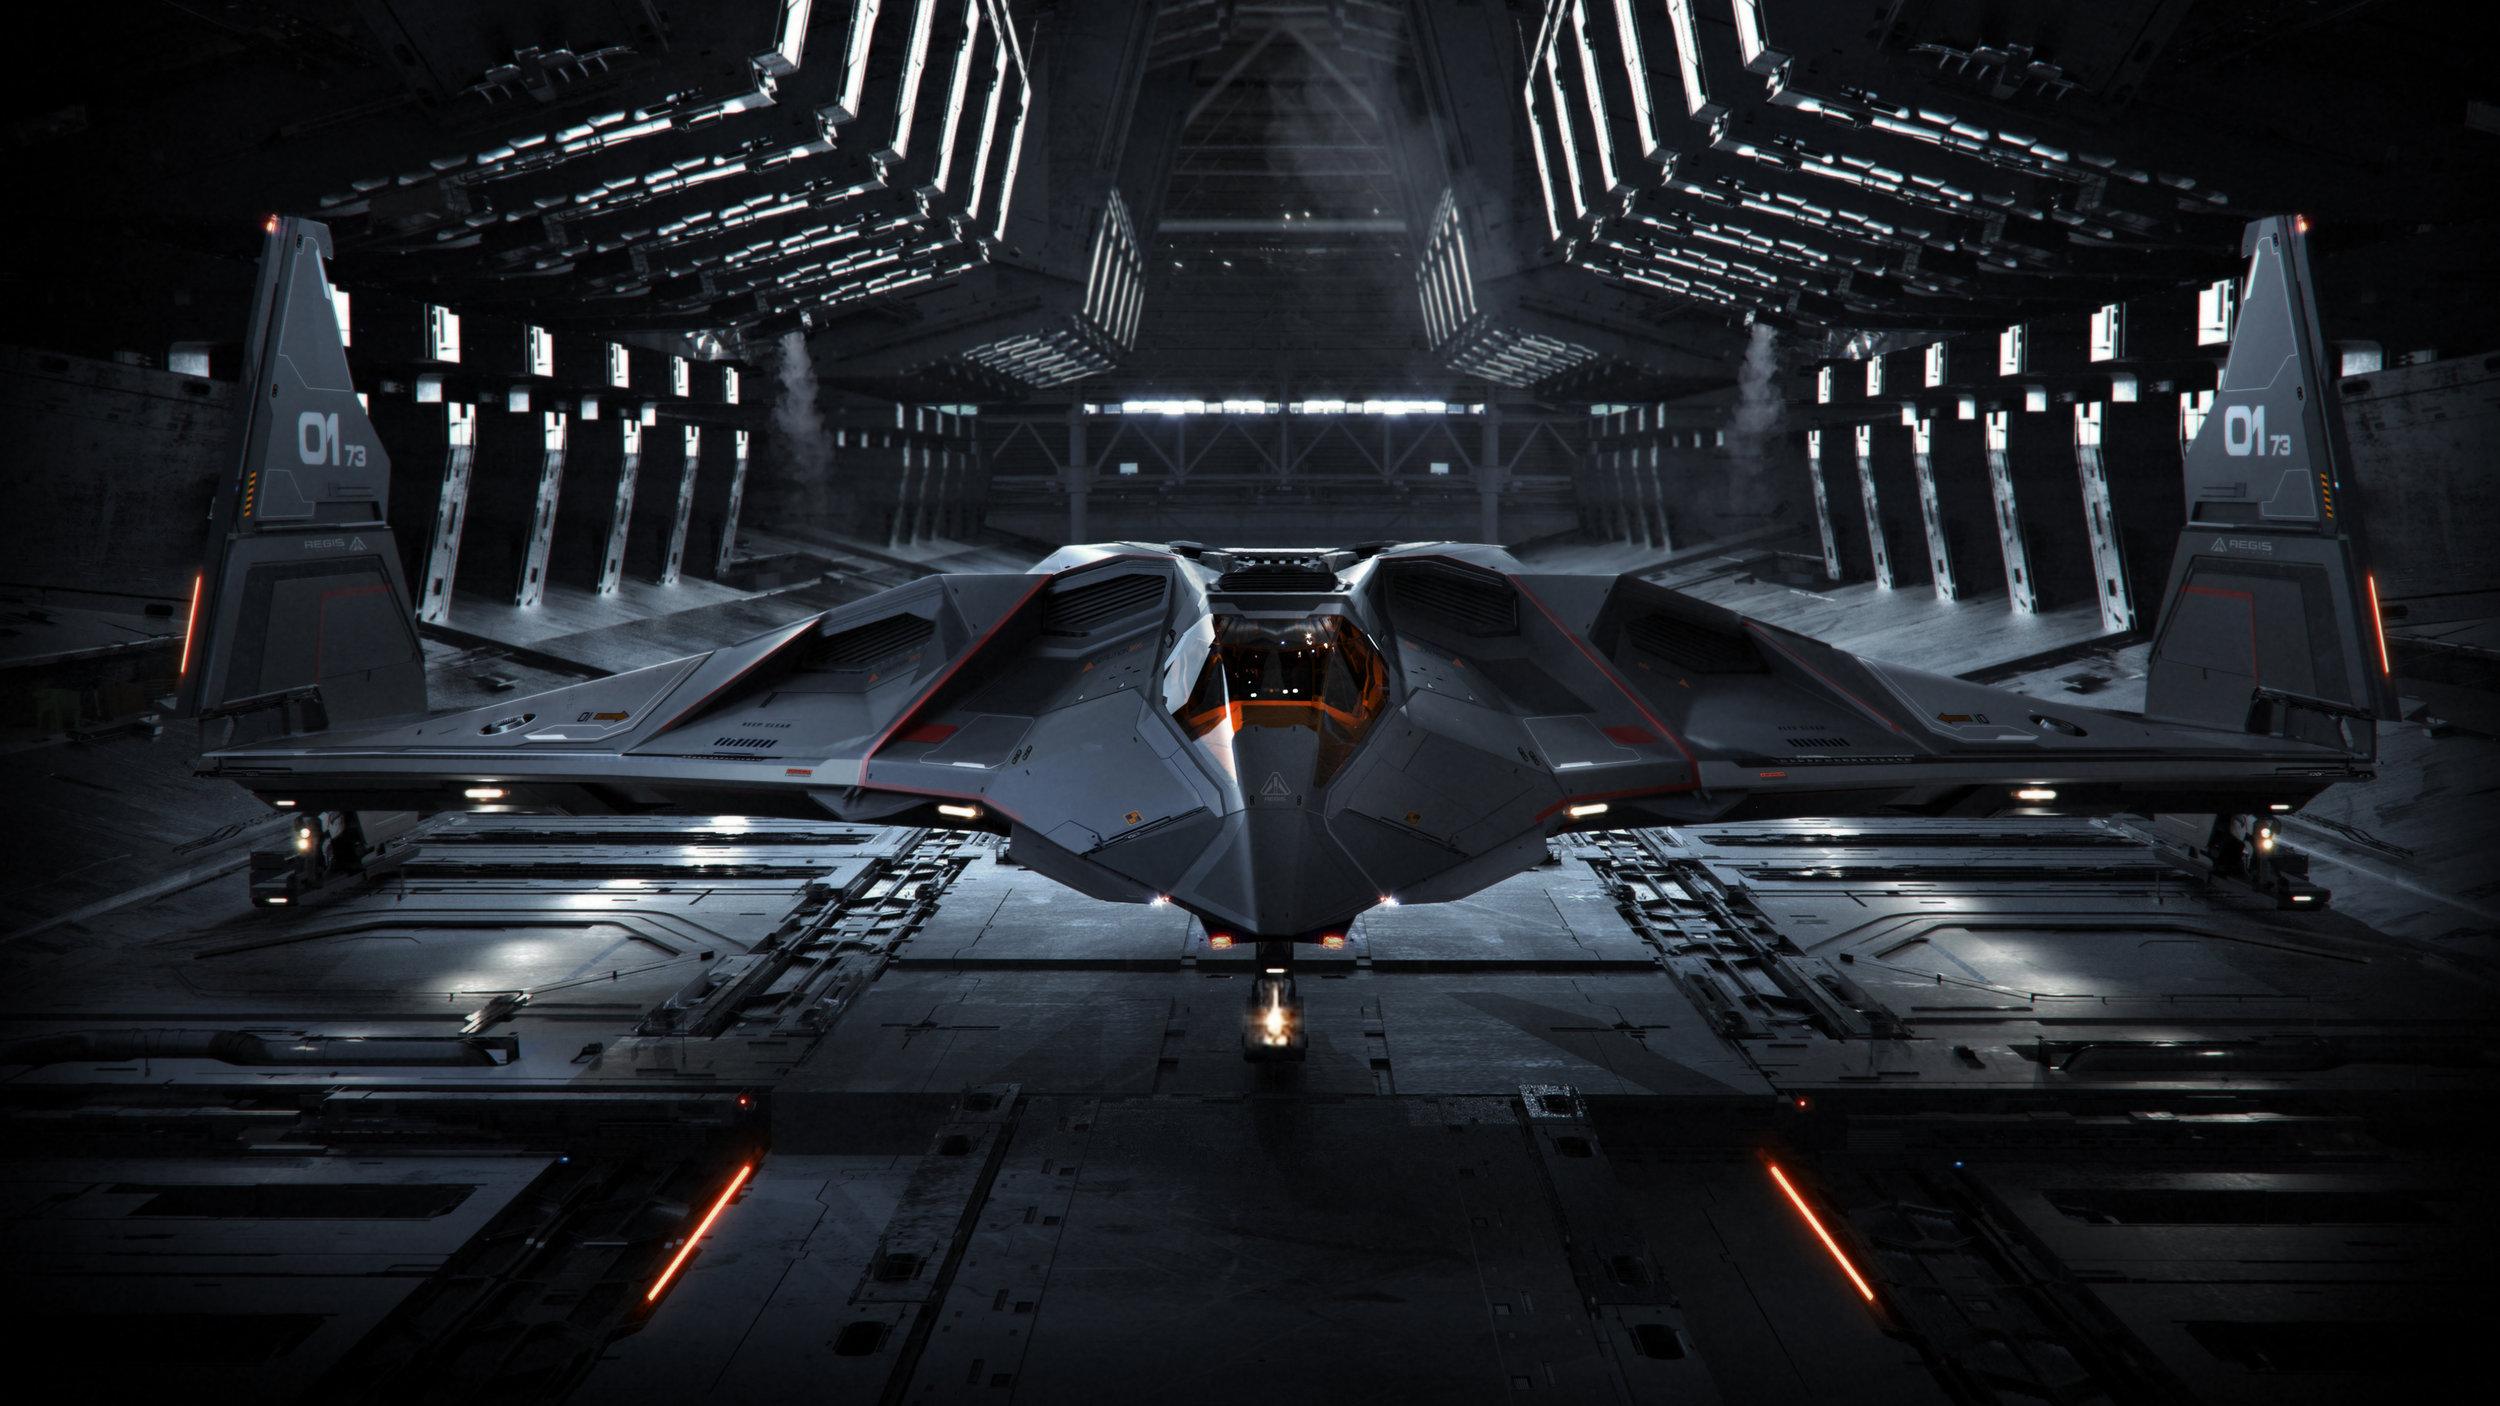 Aegis-Eclipse-L4-Piece-2-Hangar-Presentation-007.jpg